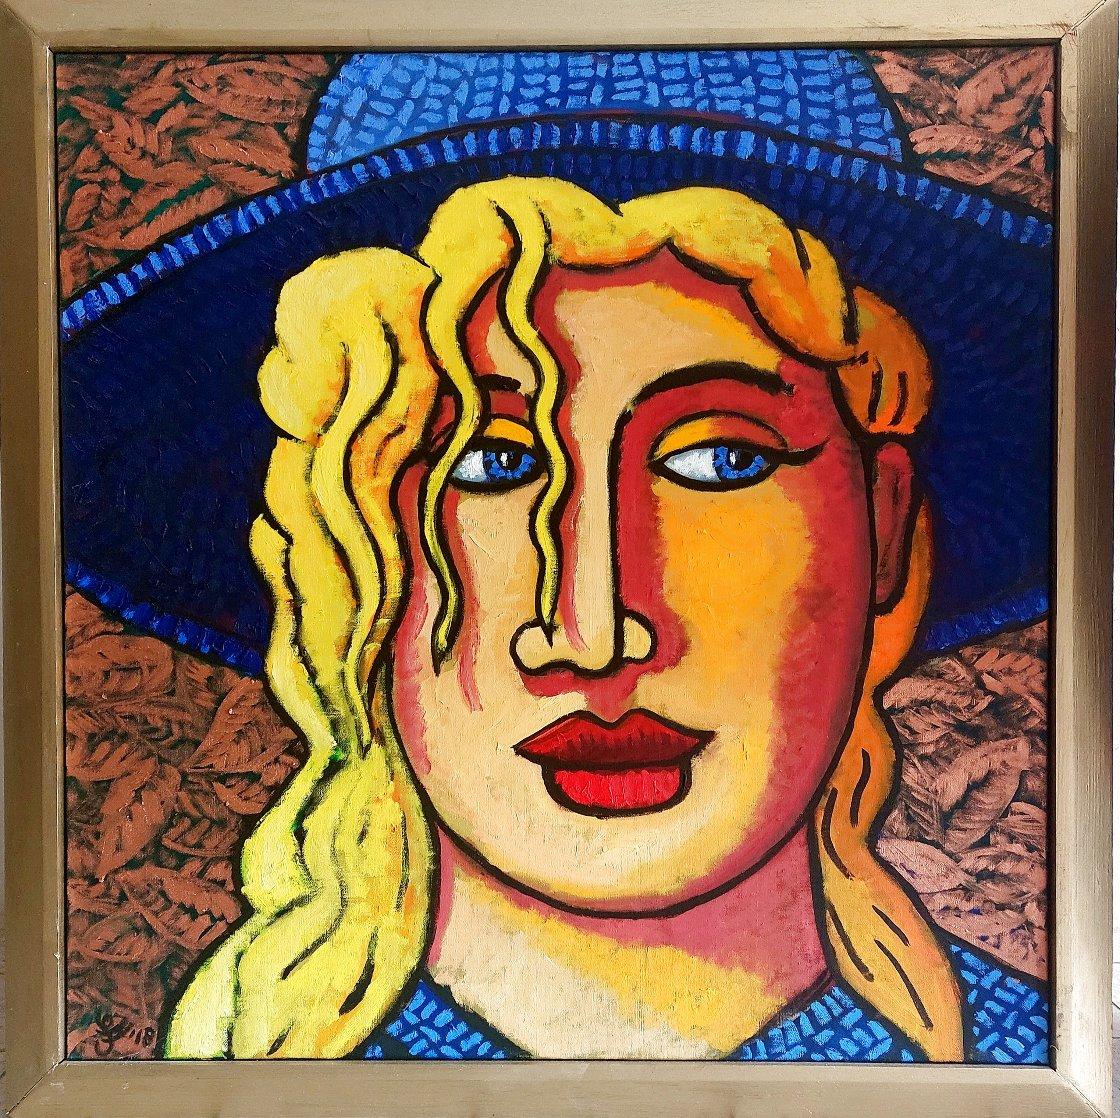 Blond 'N Blue Original 2018 35x33 Original Painting by Jacques Tange